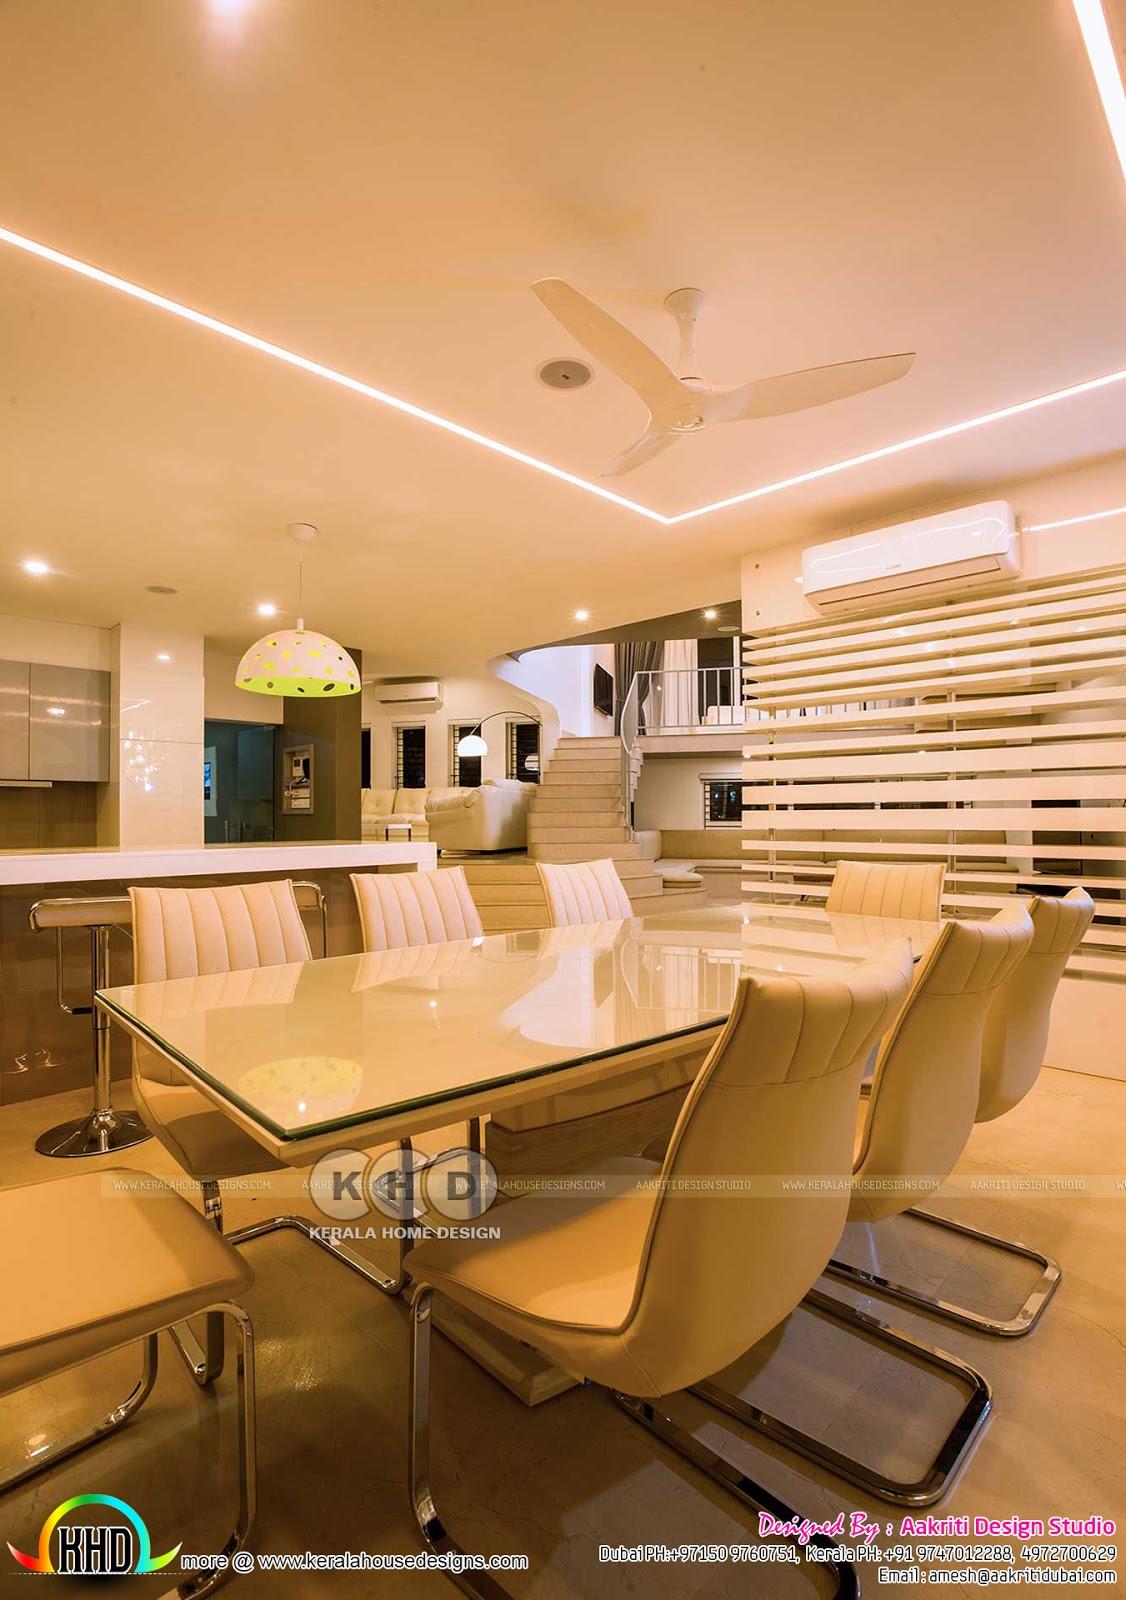 Finished villa interiors designs kerala home design and for Villa interior design photos